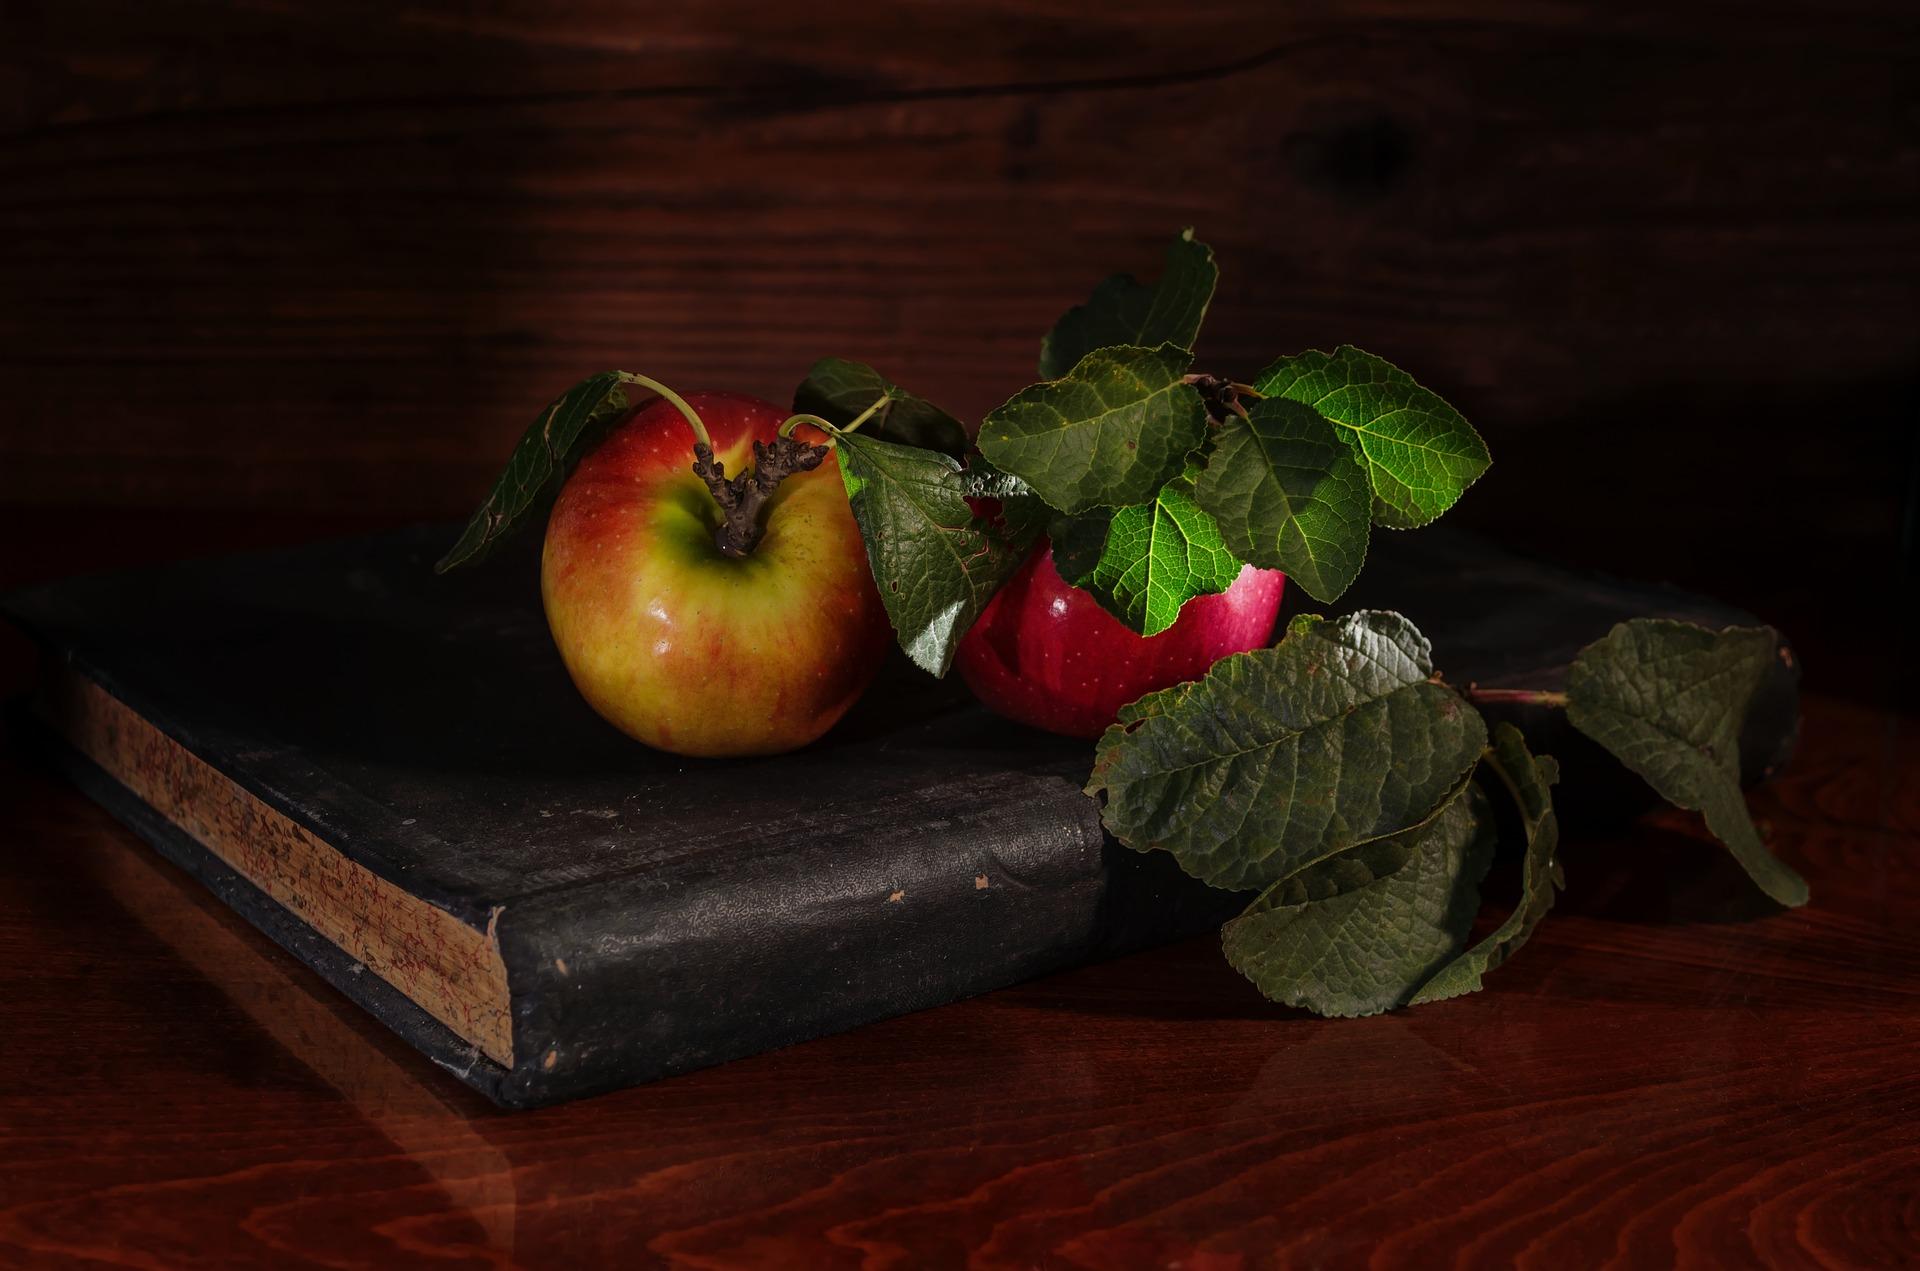 apples-2858229_1920